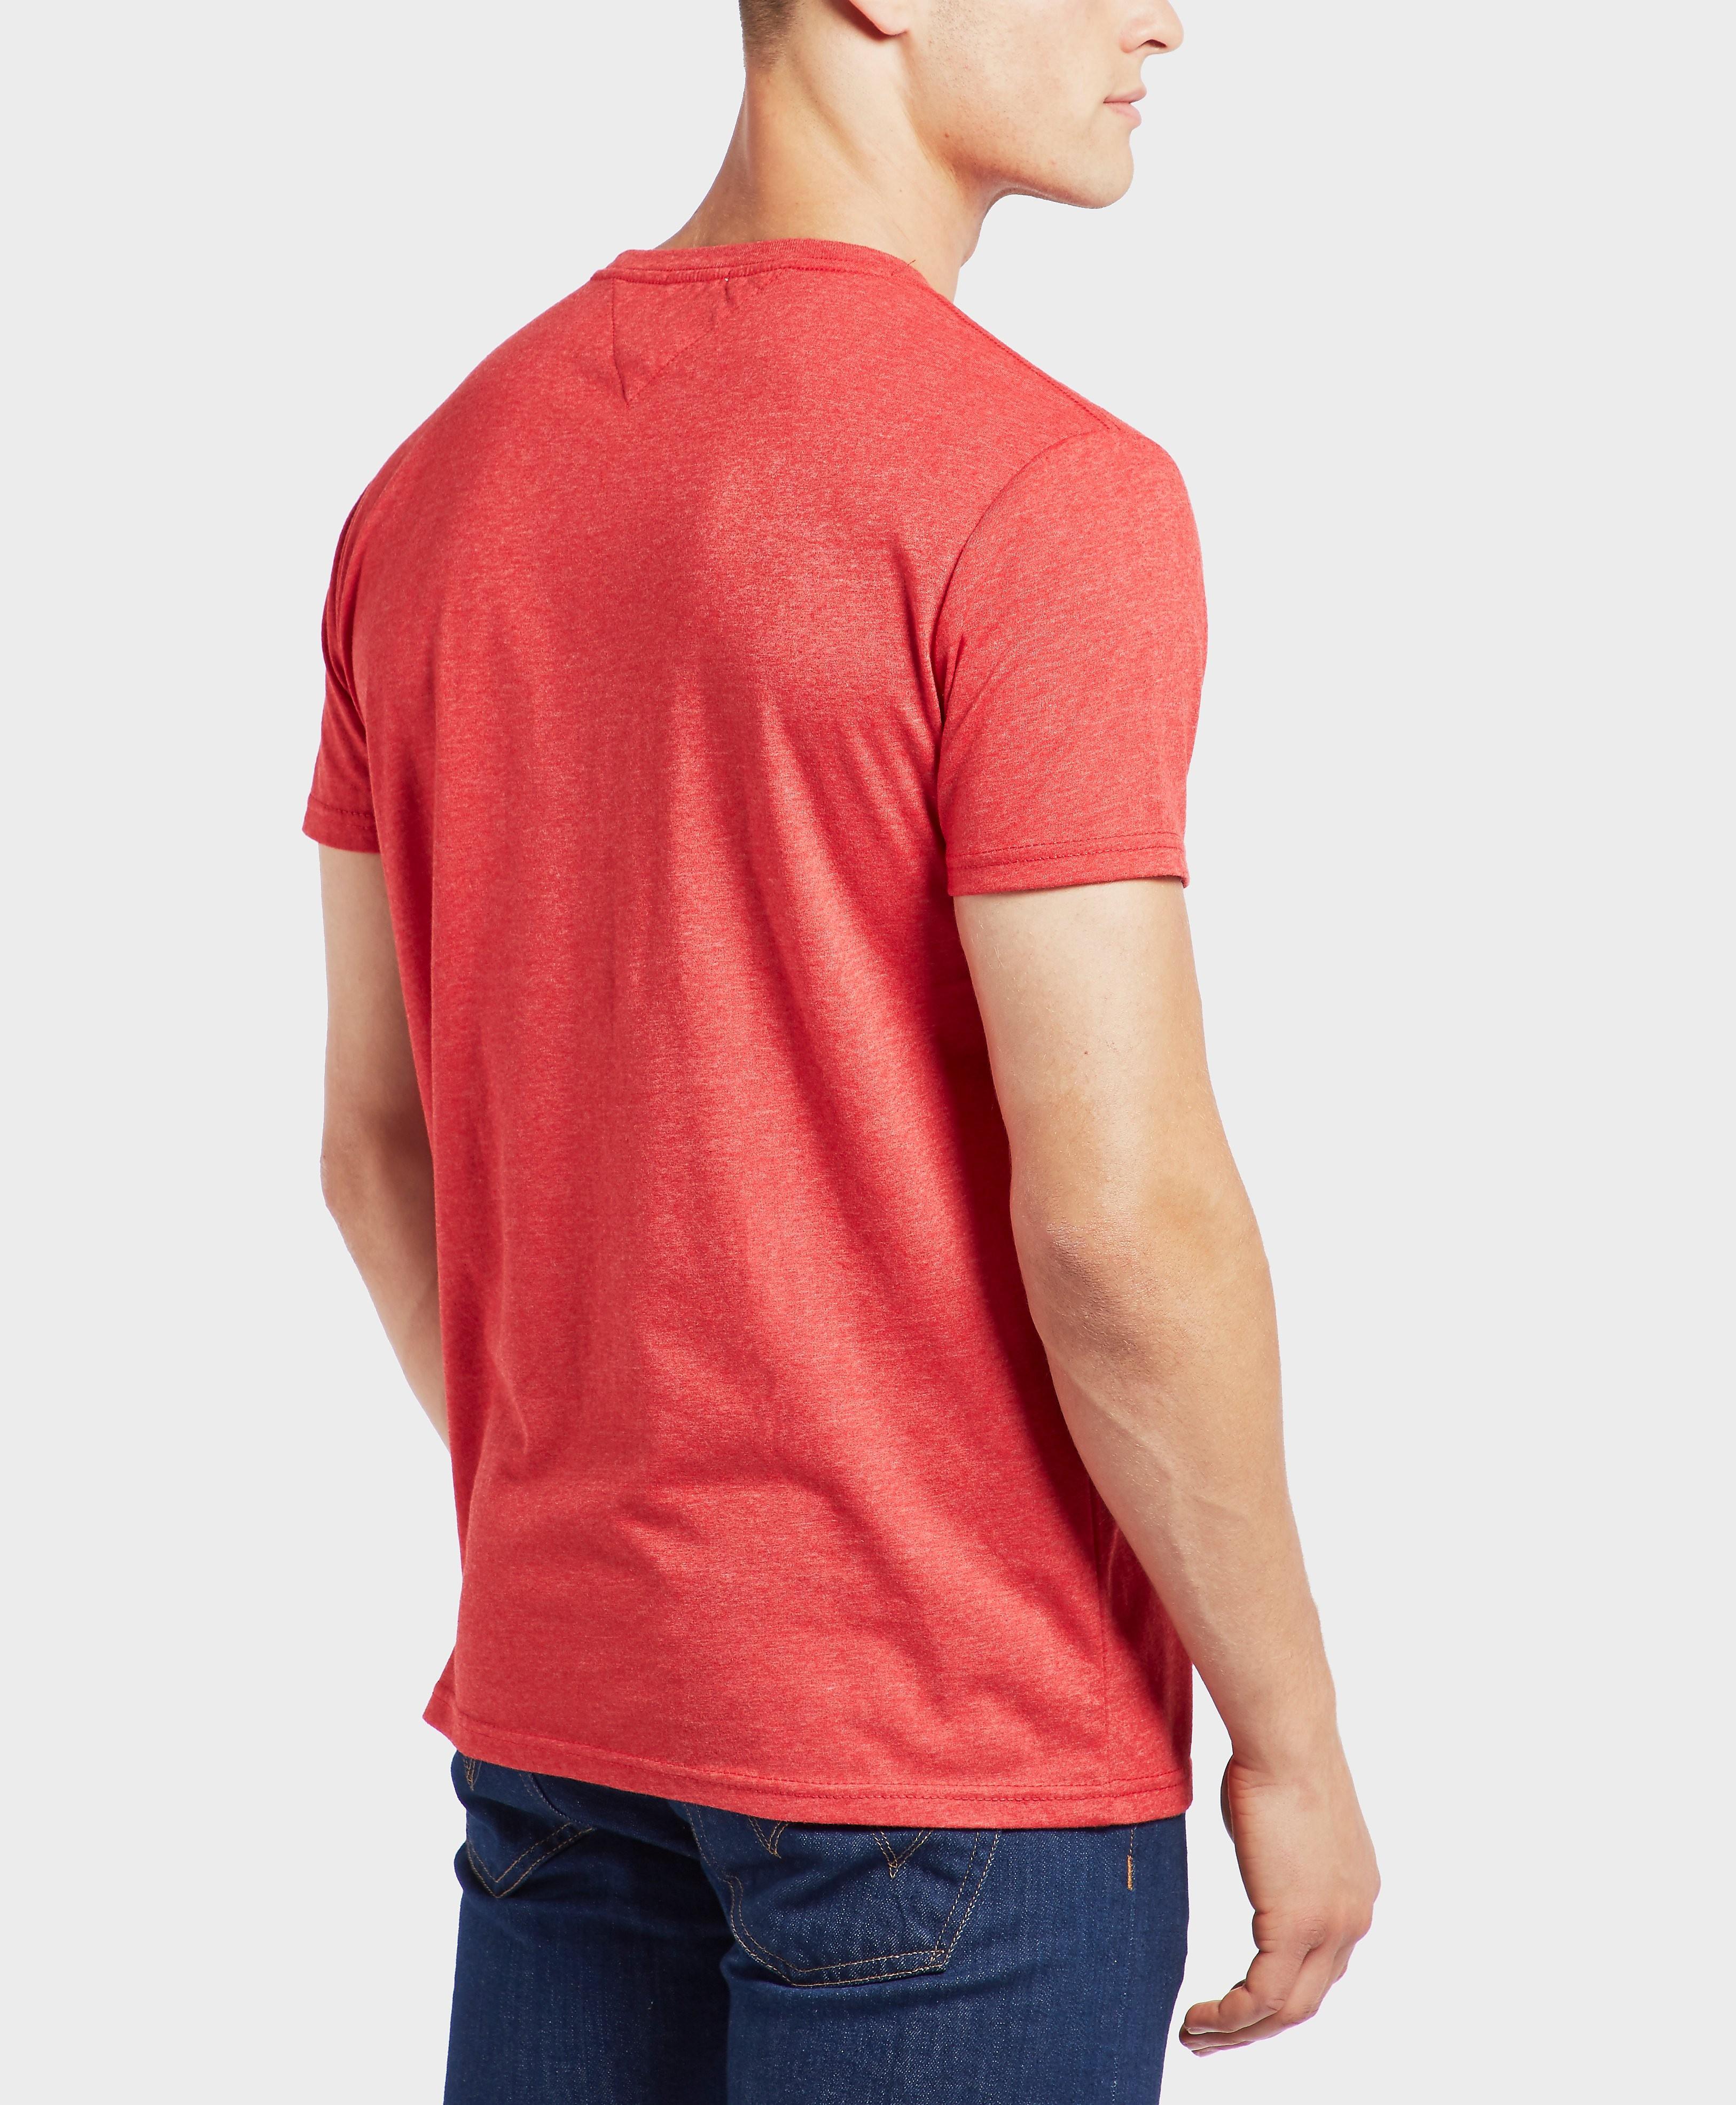 Tommy Hilfiger NYC Logo Short Sleeve T-Shirt